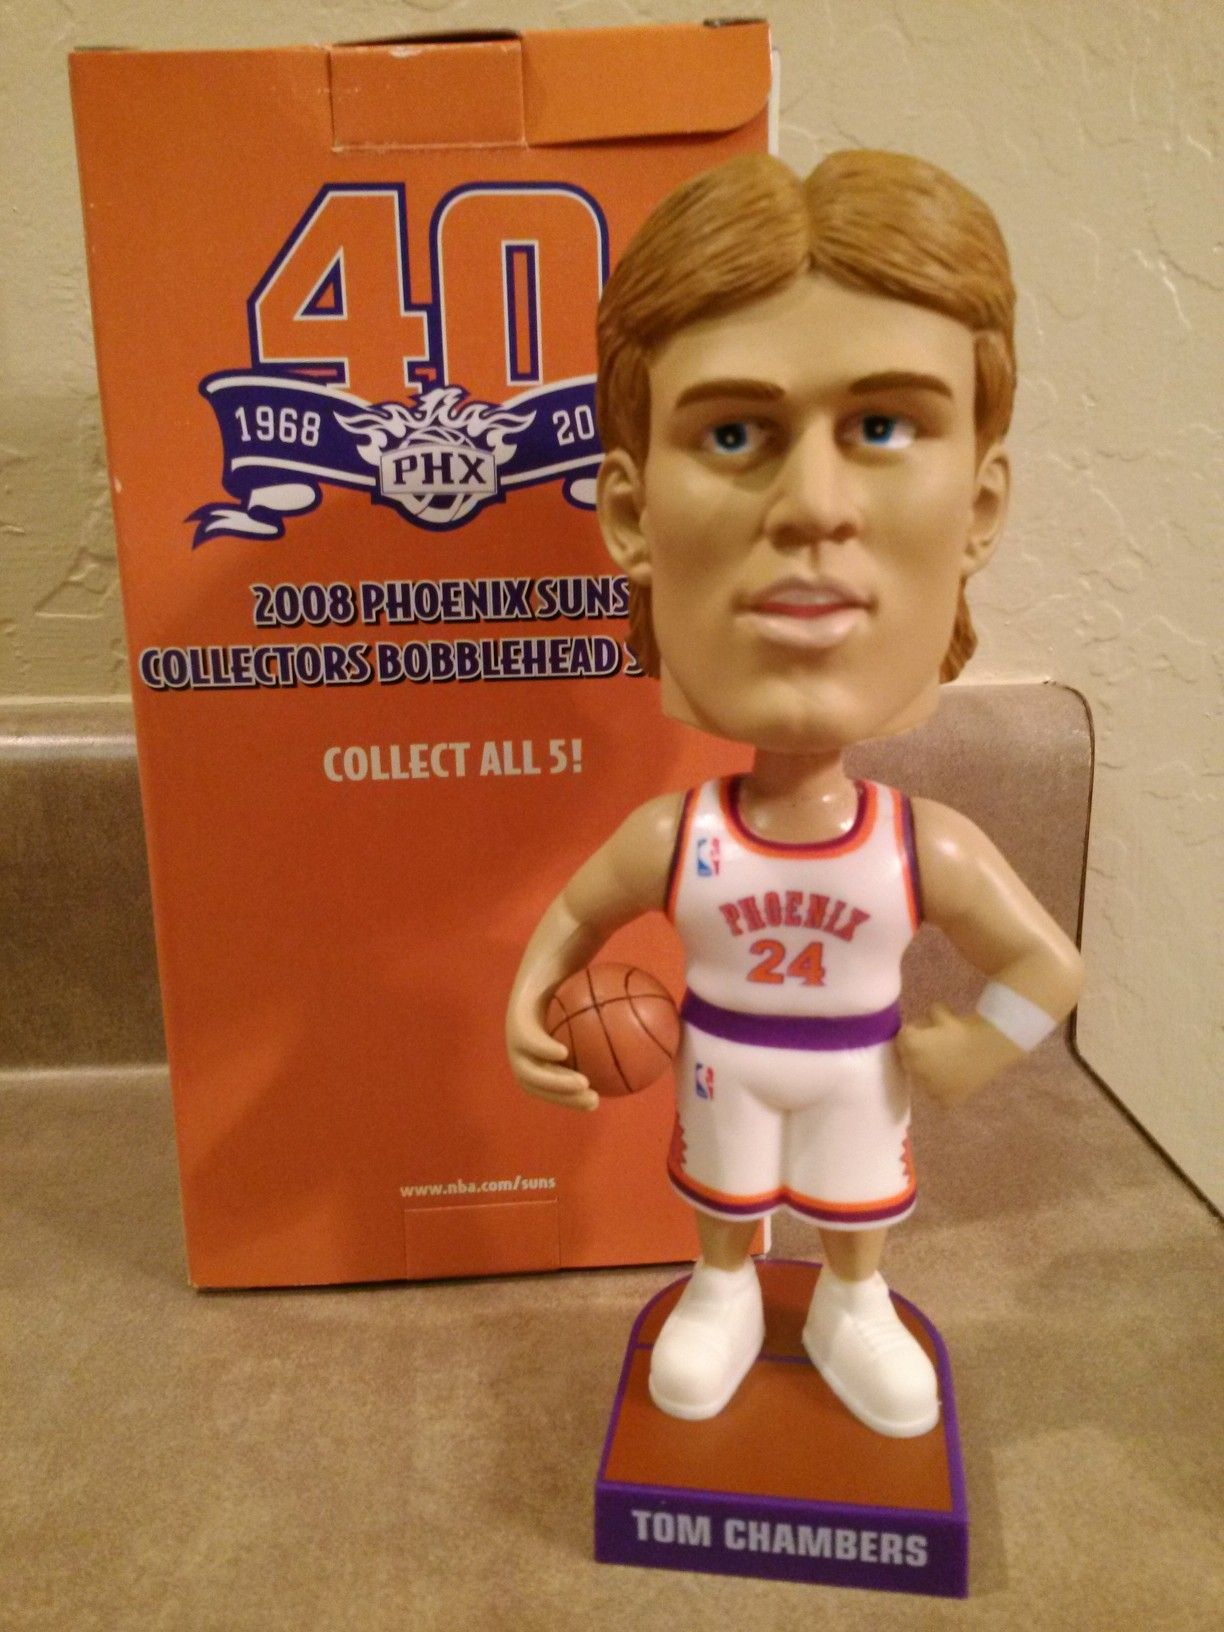 Tom Chambers Bobblehead Suns 40th Anniversary